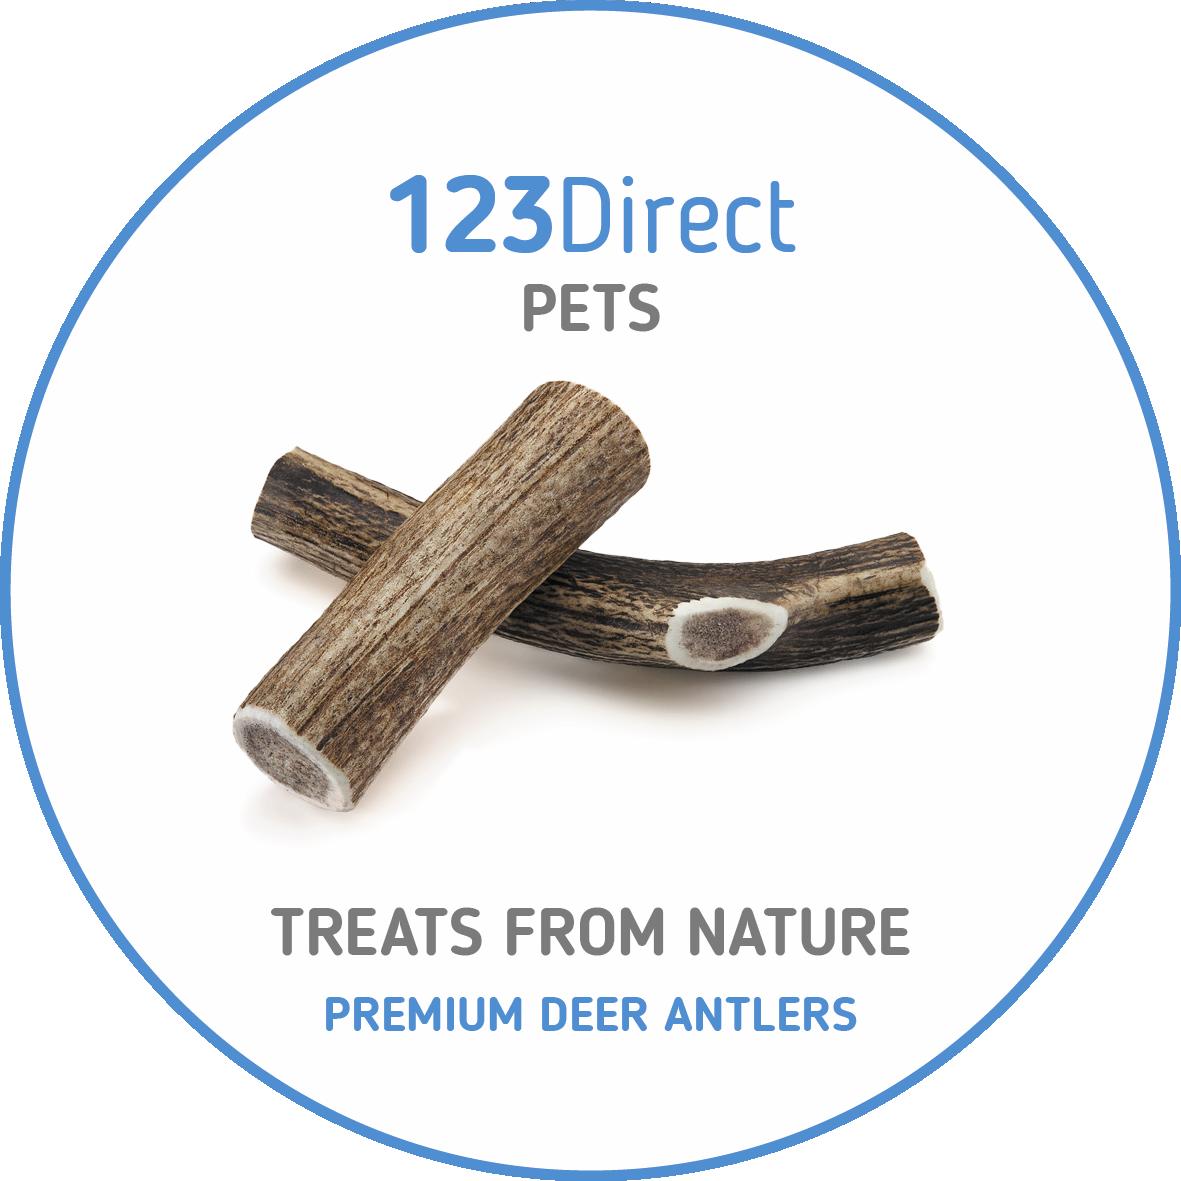 123 Direct Pets